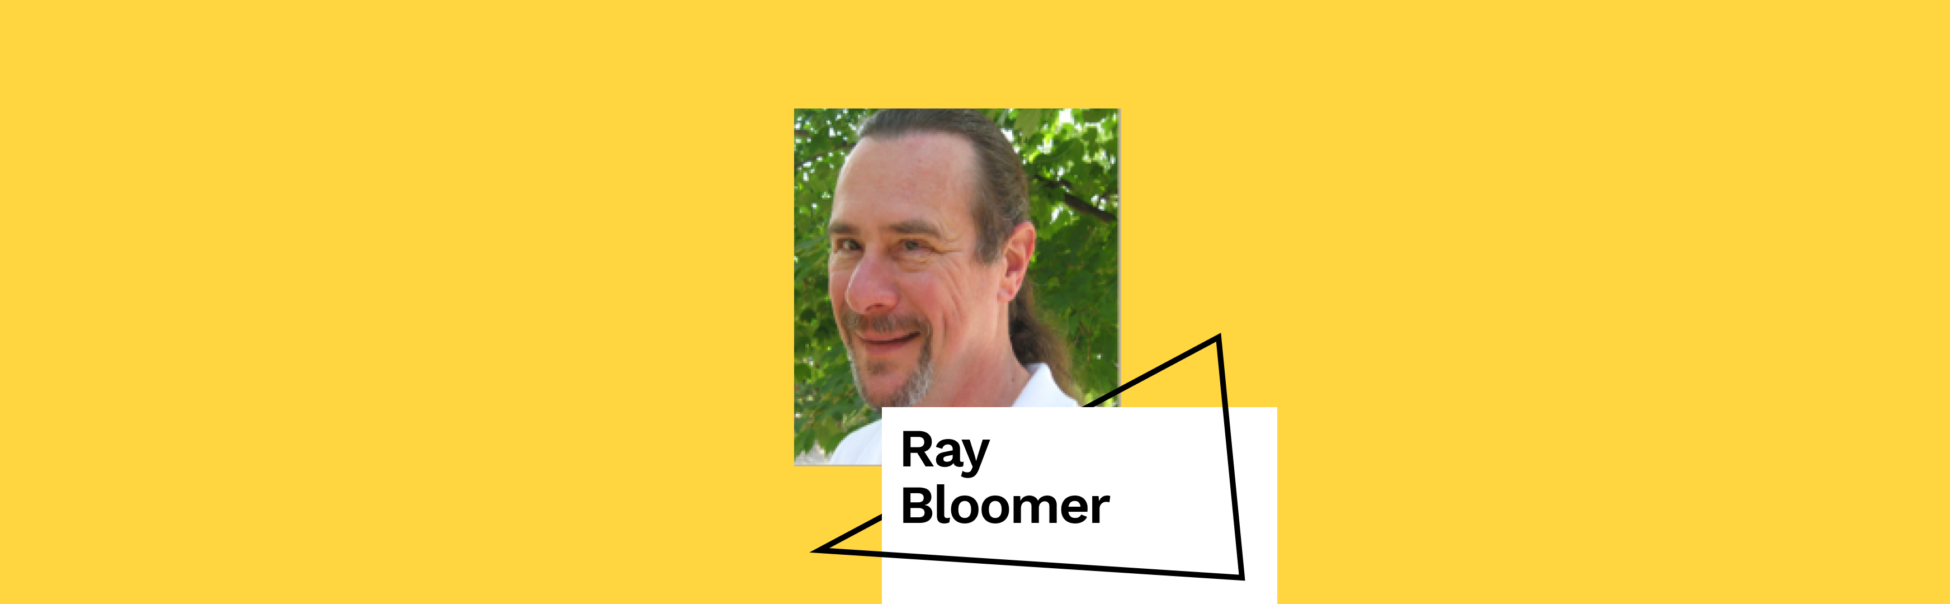 Ray Bloomer